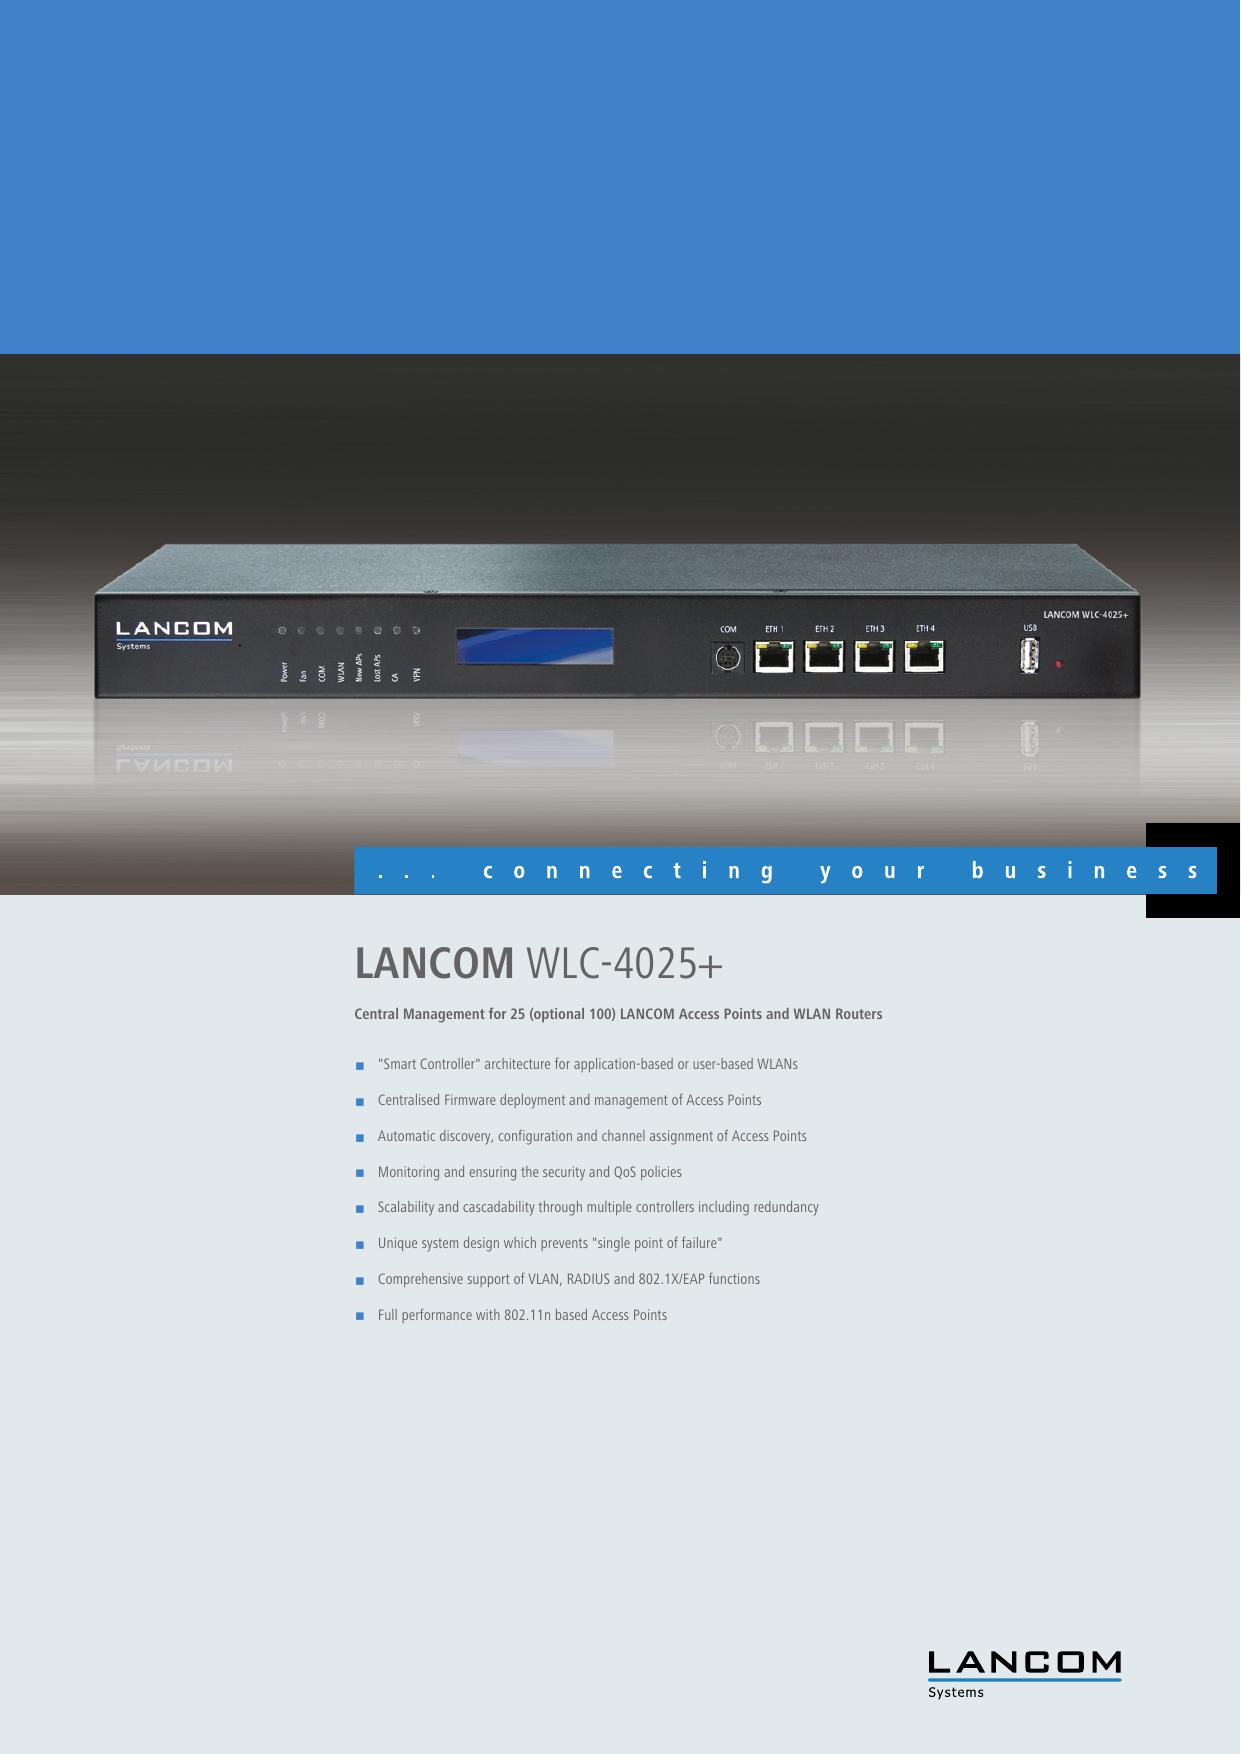 lancom 1781ew firmware